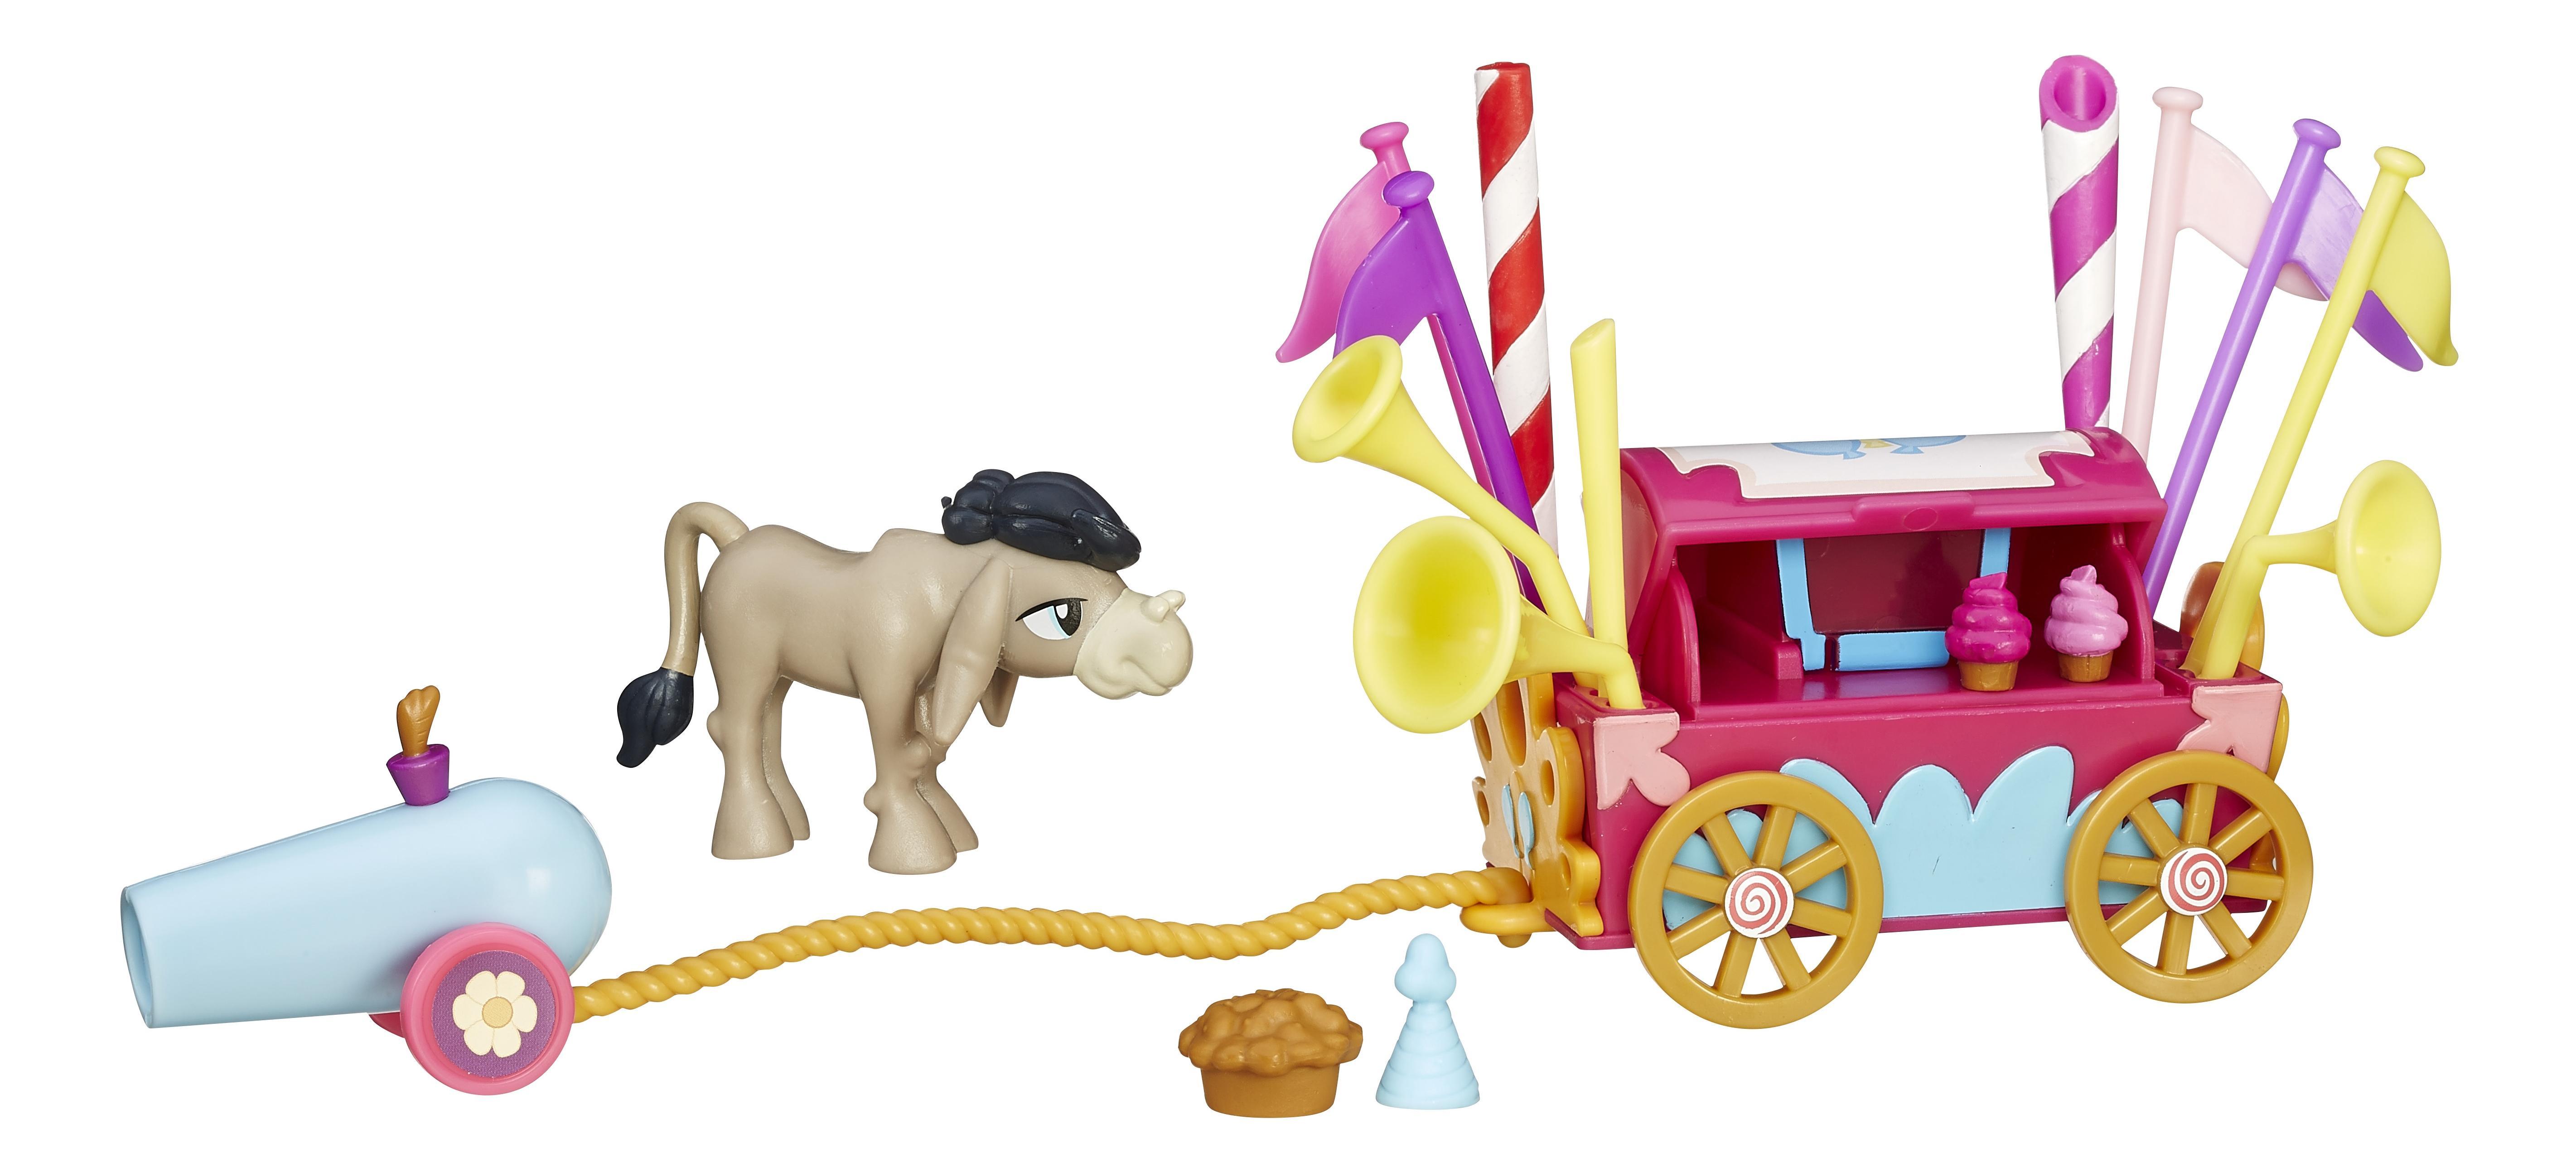 картинки тележка для пони